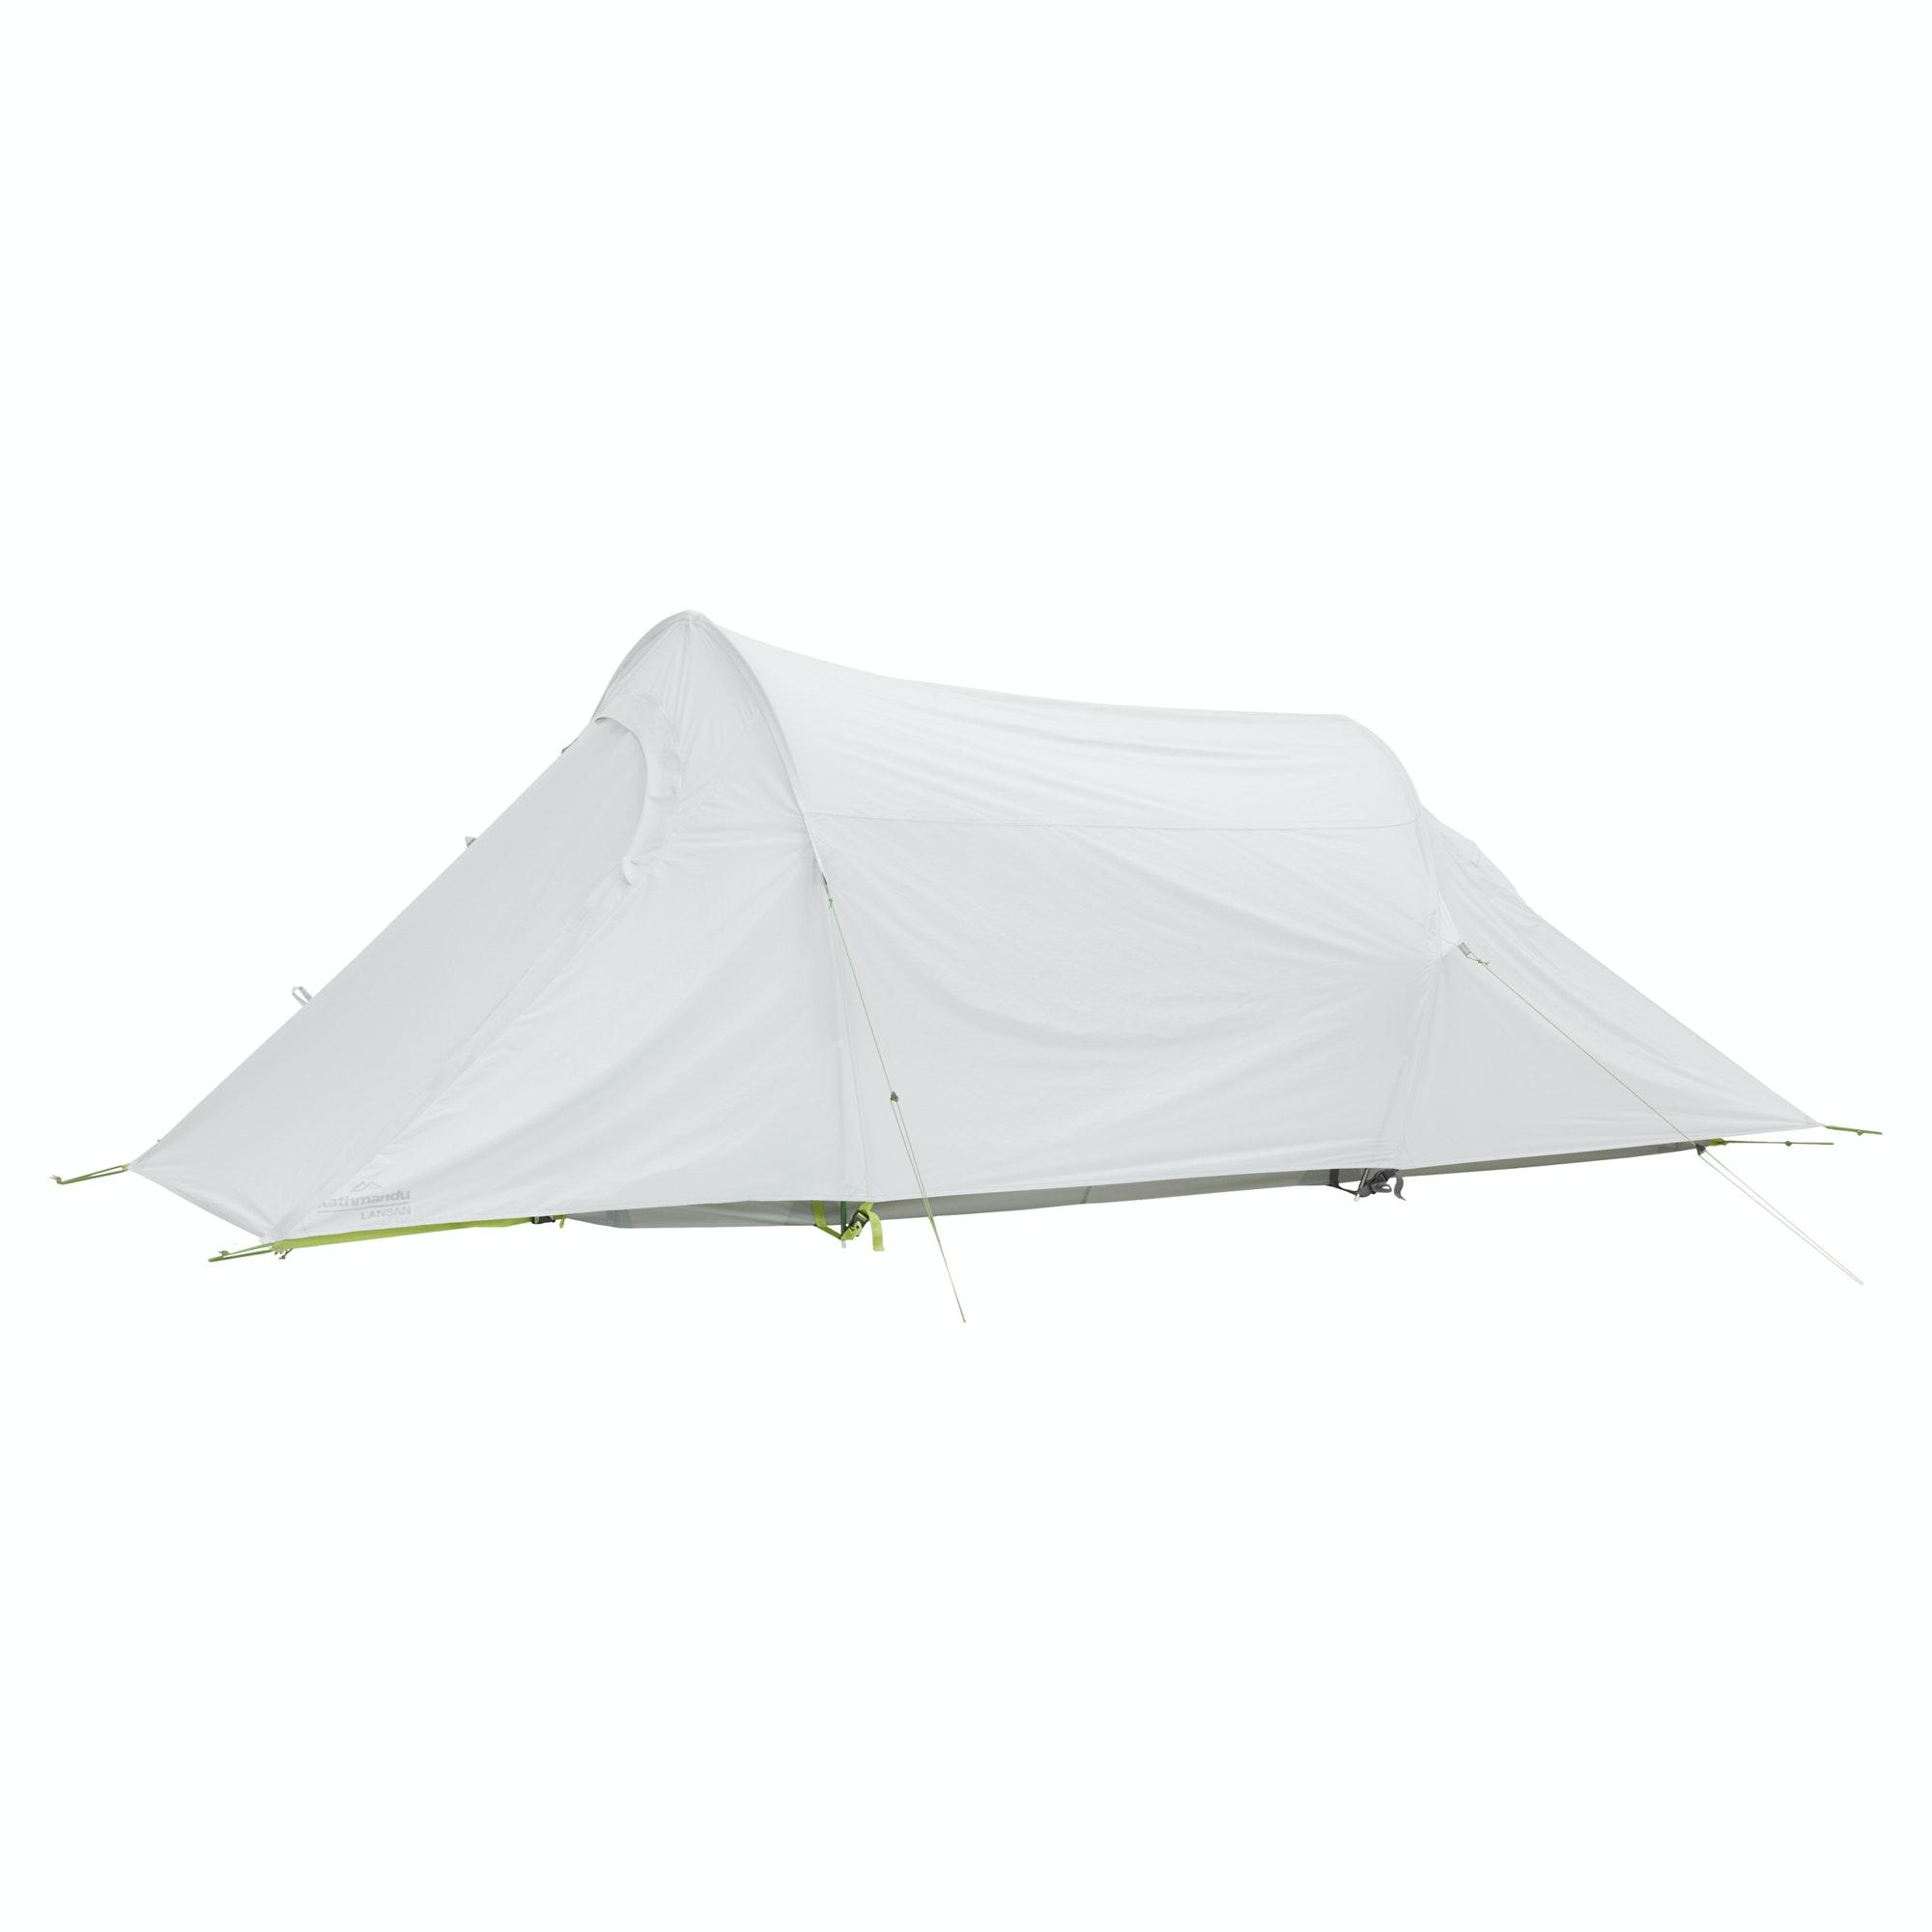 Details about NEW Kathmandu Lansan Ultralight Weatherproof Dome 2 Person C&ing Tent  sc 1 st  eBay & NEW Kathmandu Lansan Ultralight Weatherproof Dome 2 Person Camping ...